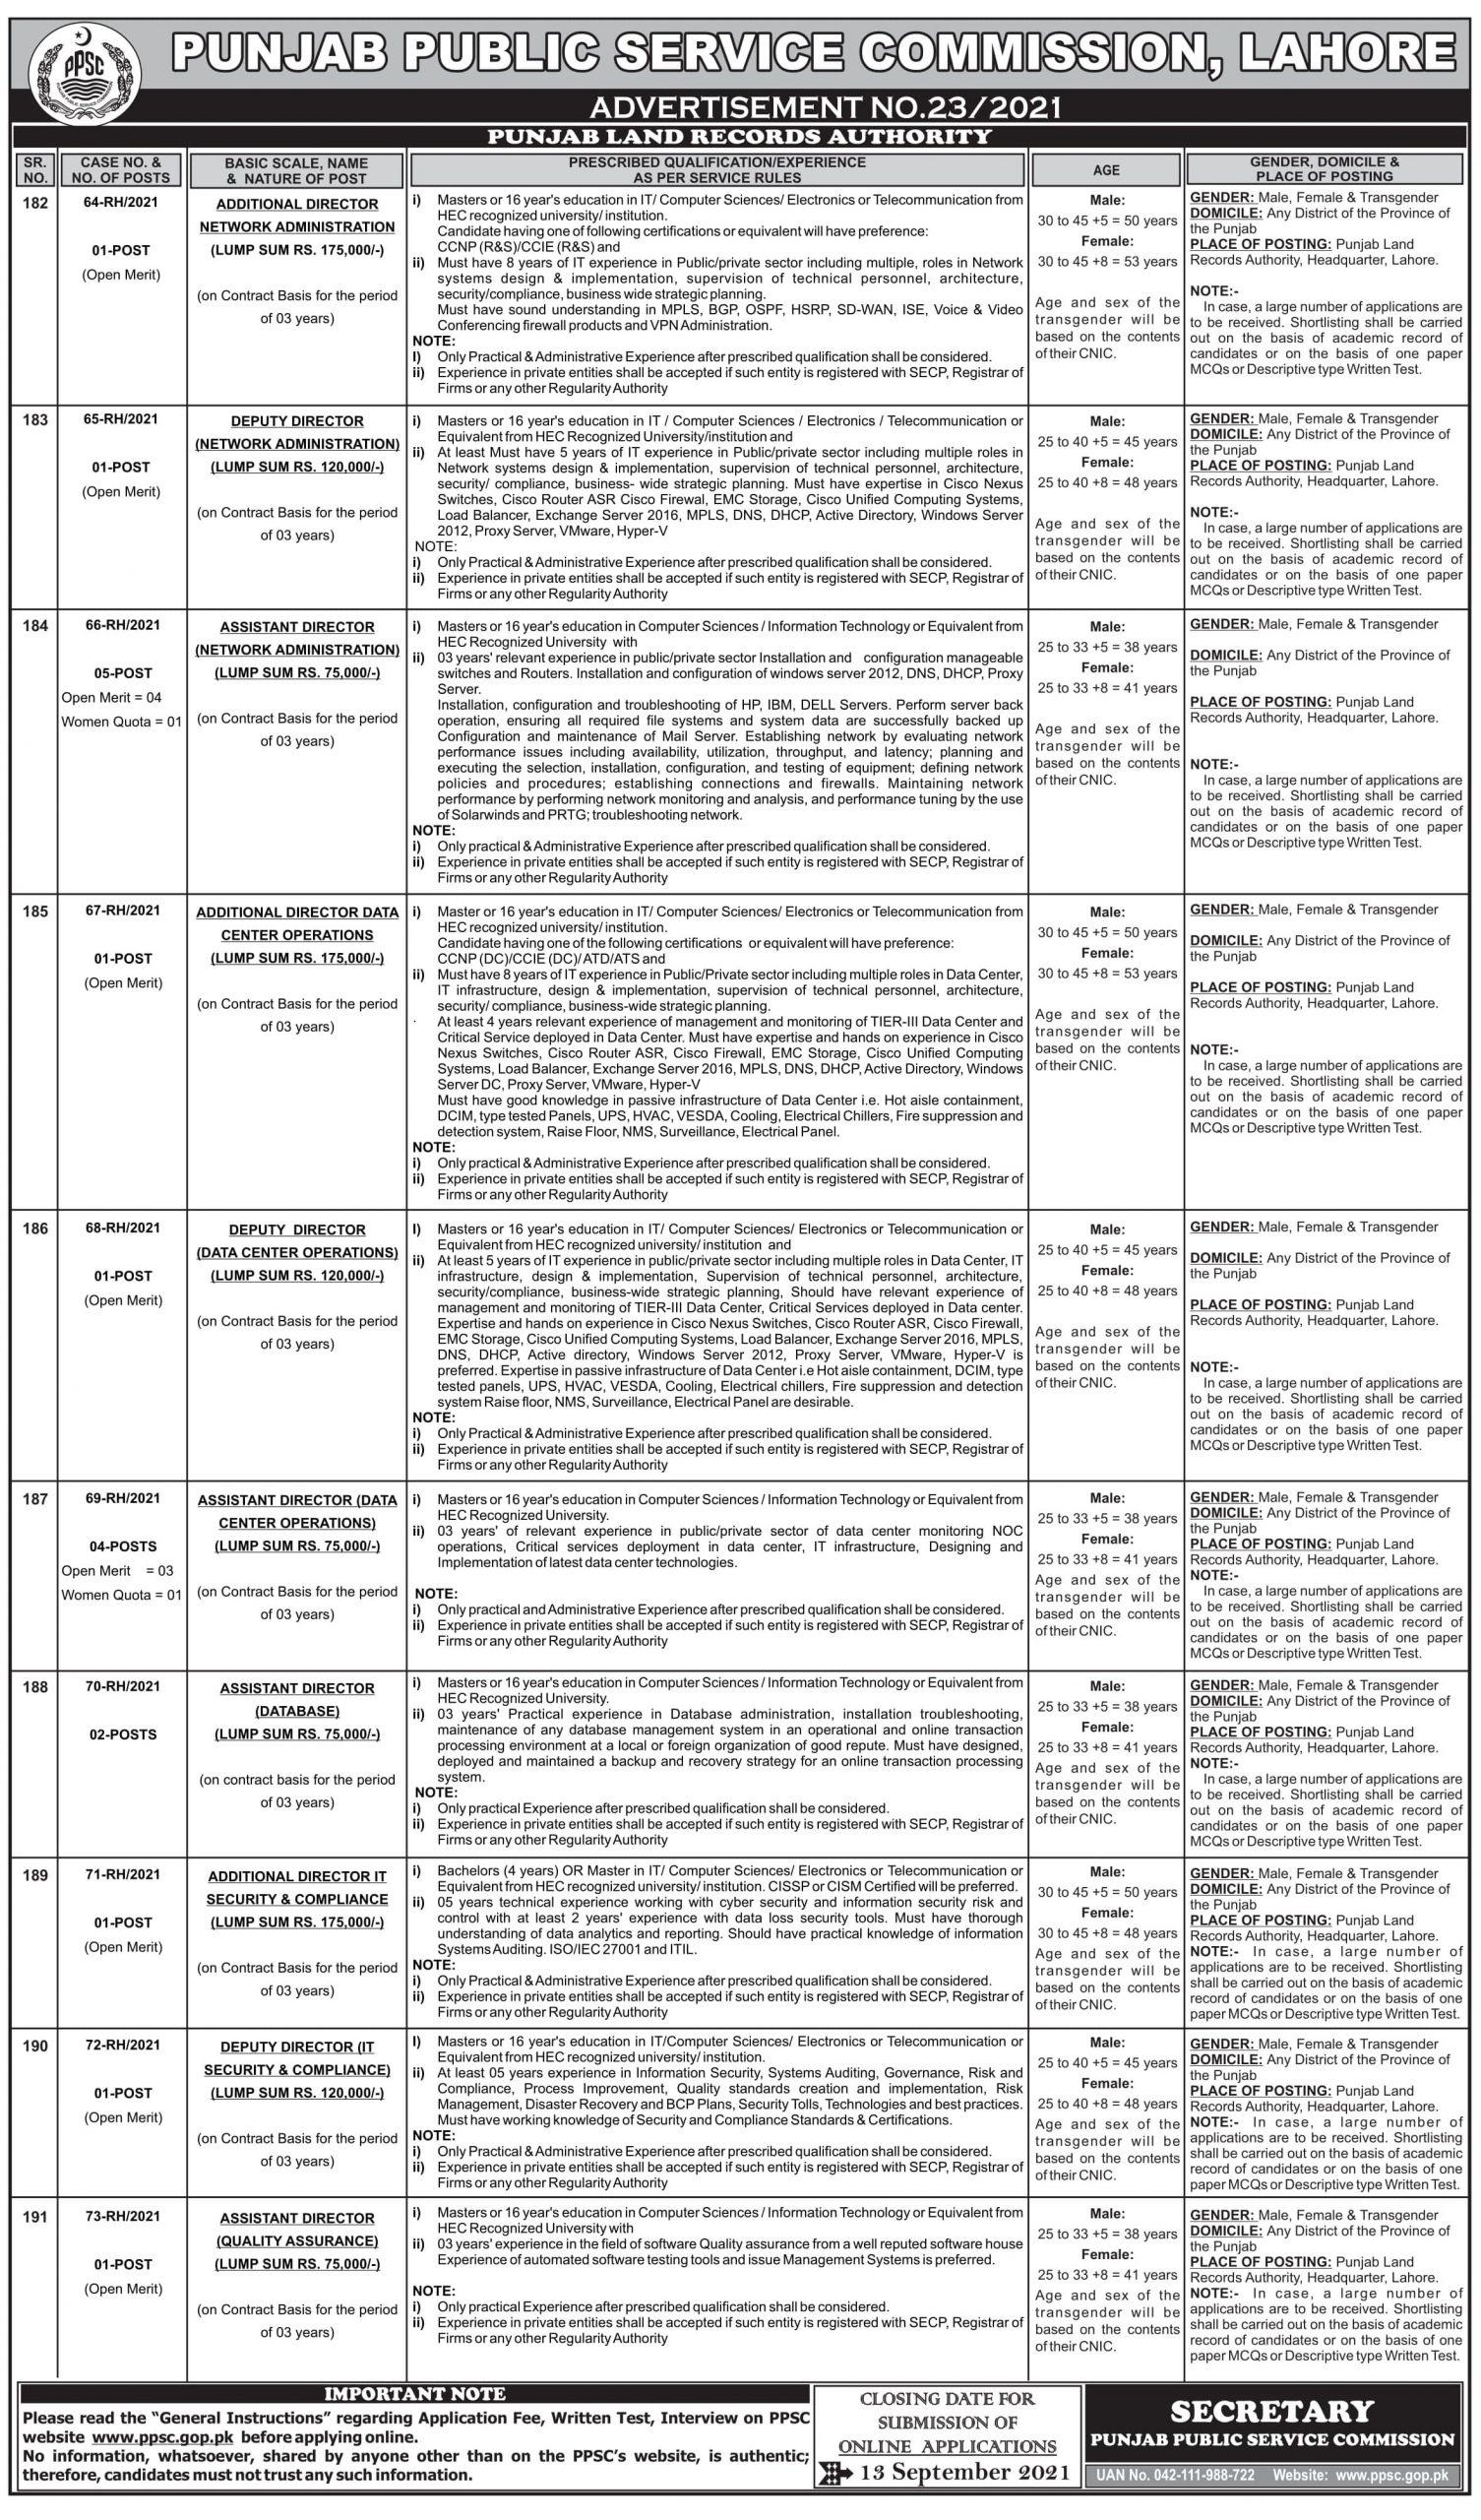 PPSC Jobs Advertisement No 23 - 2021 Pdf Download